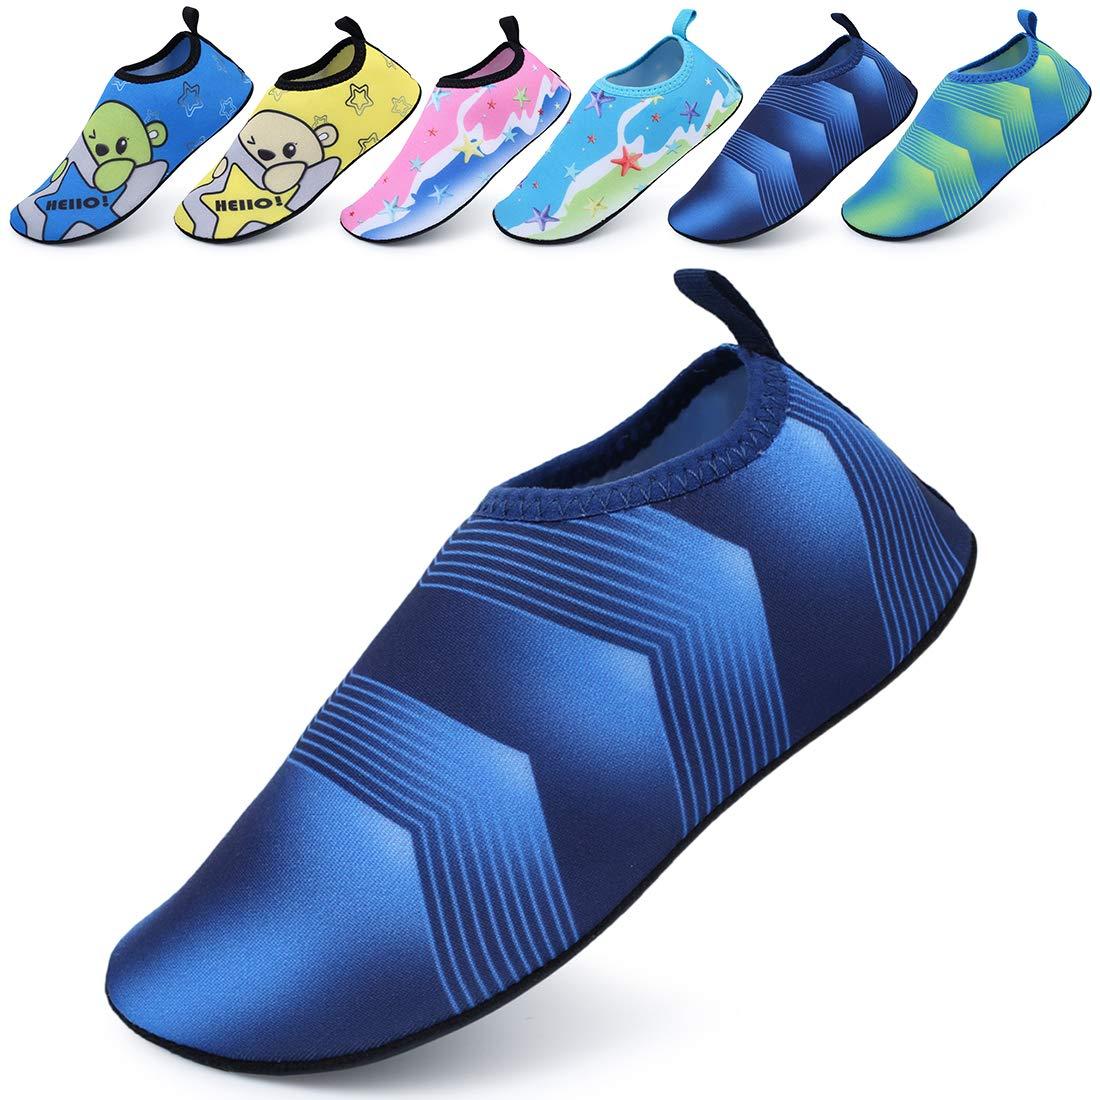 BODATU Boys' Girls' Swim Water Shoes Kids Quick Dry Barefoot Aqua Sock Shoes for Beach Pool Blue 2 32-33